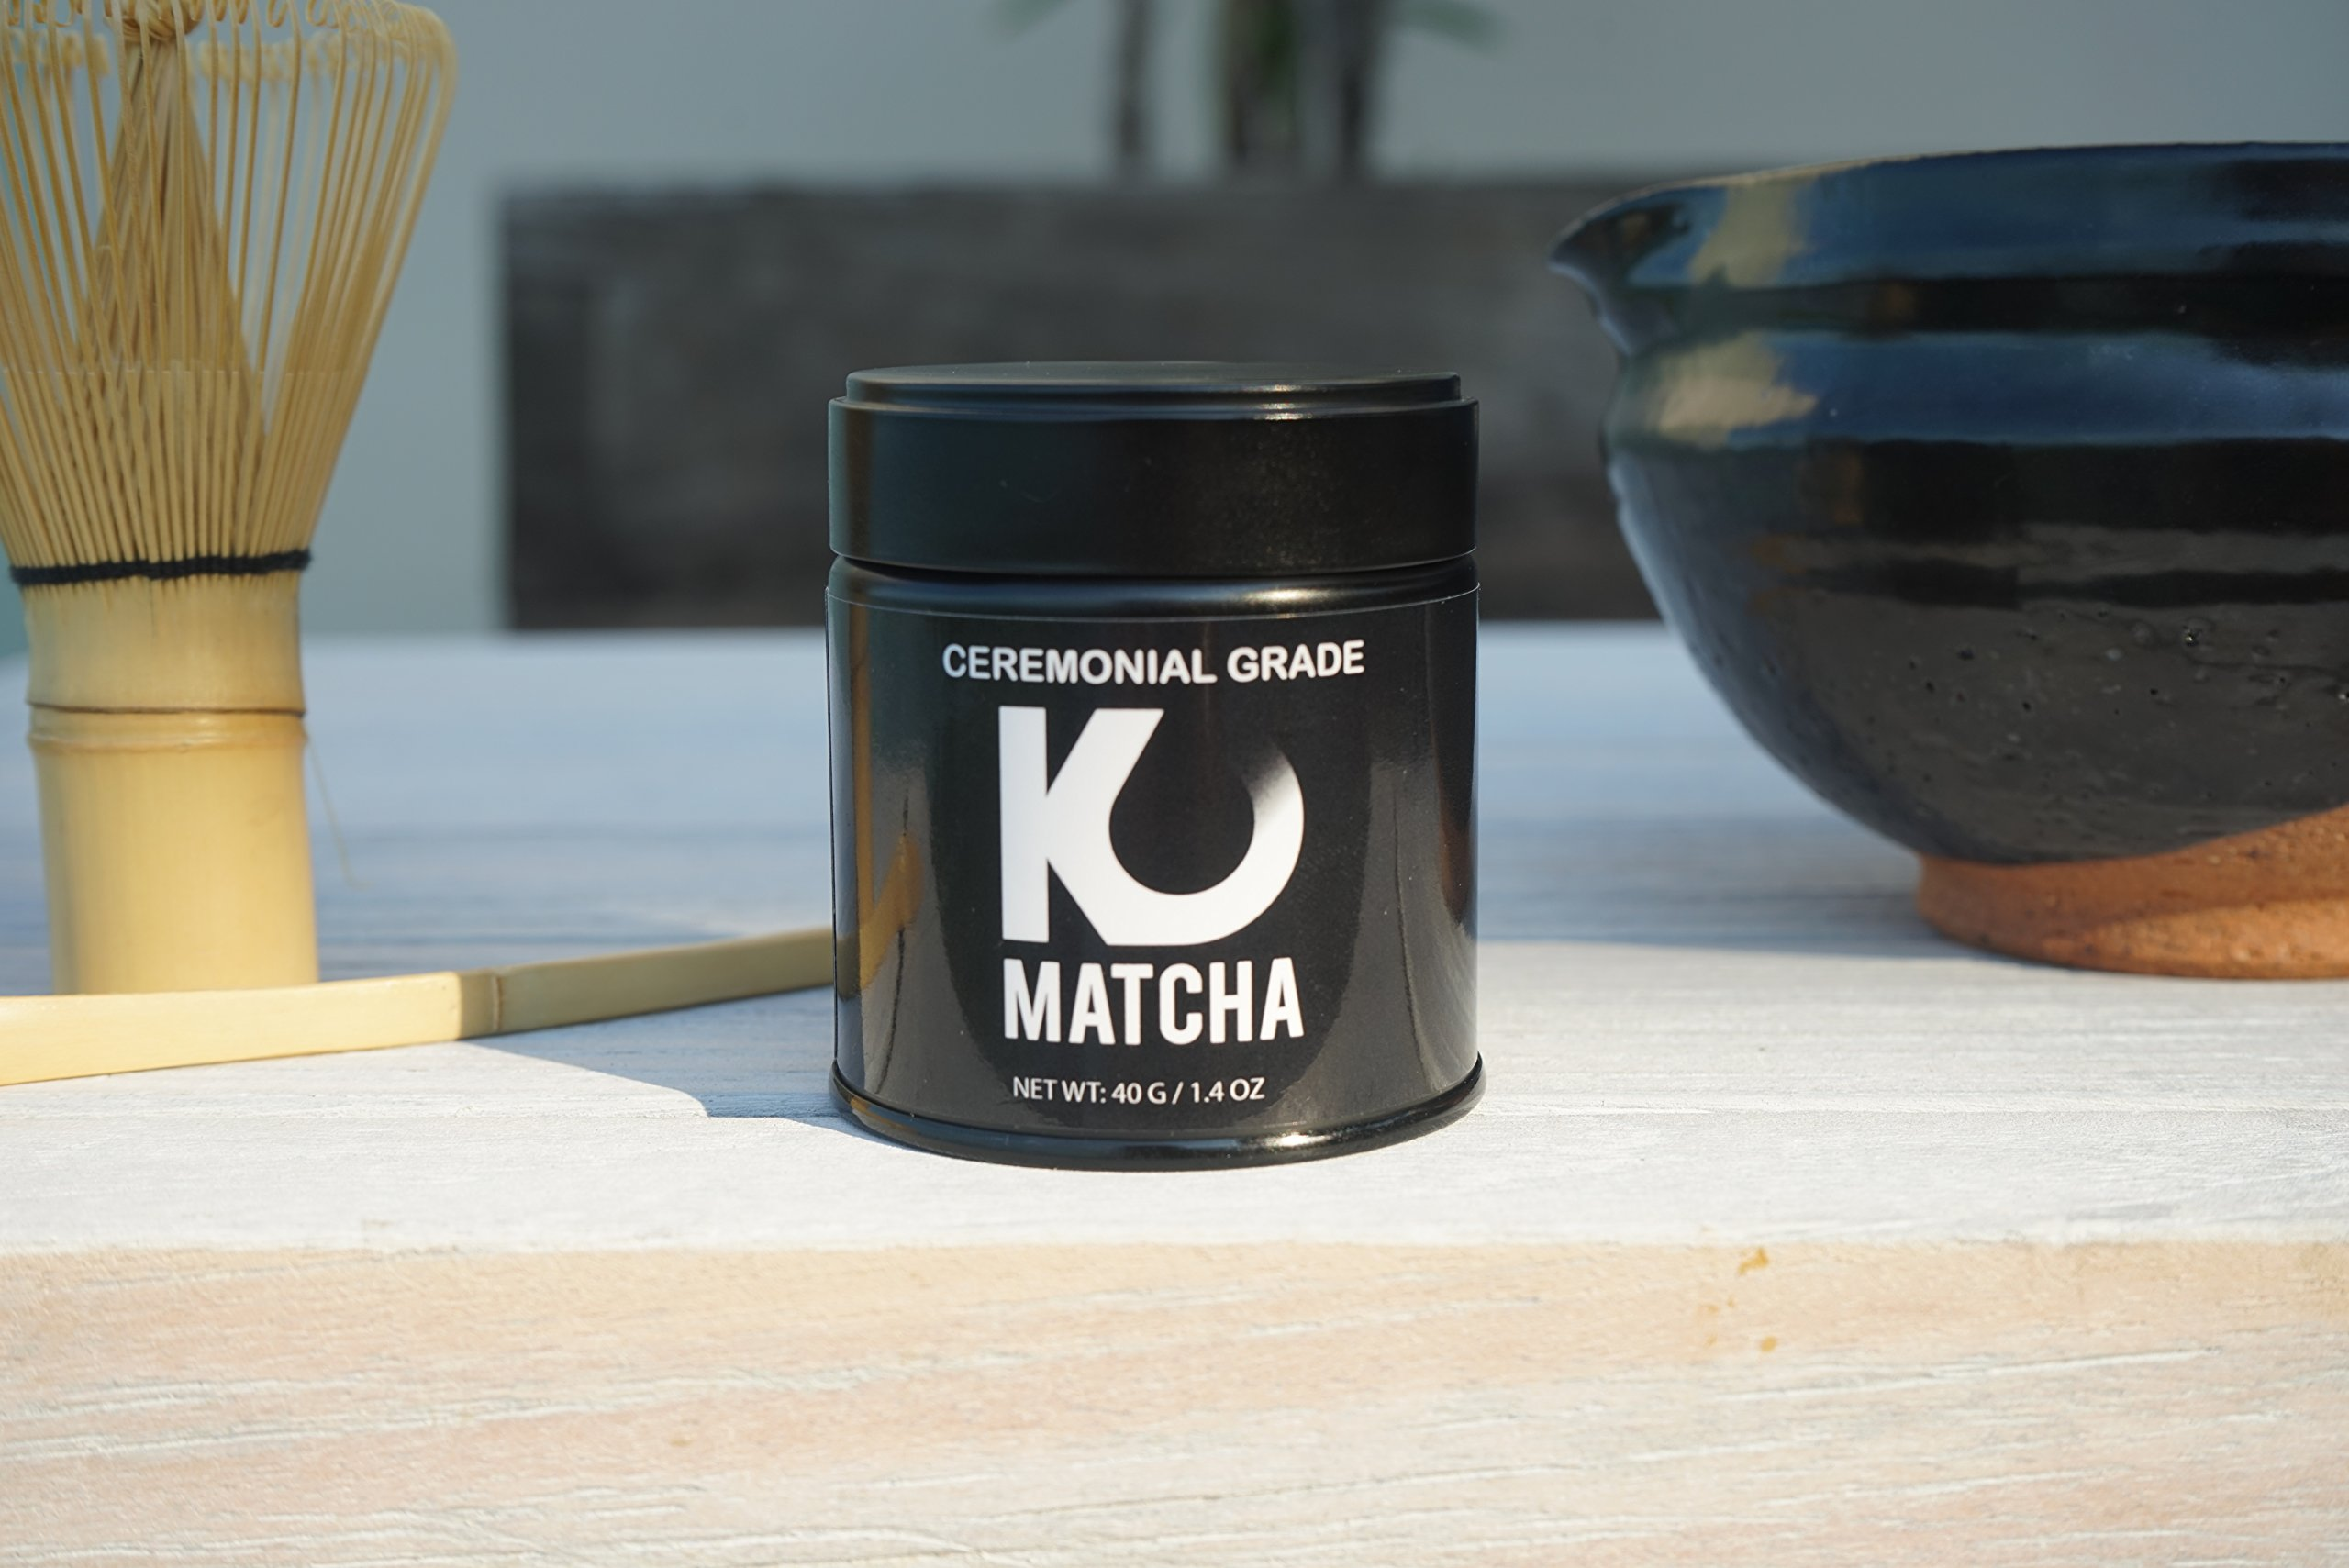 KO Matcha Ceremonial Grade by KO Matcha (Image #3)